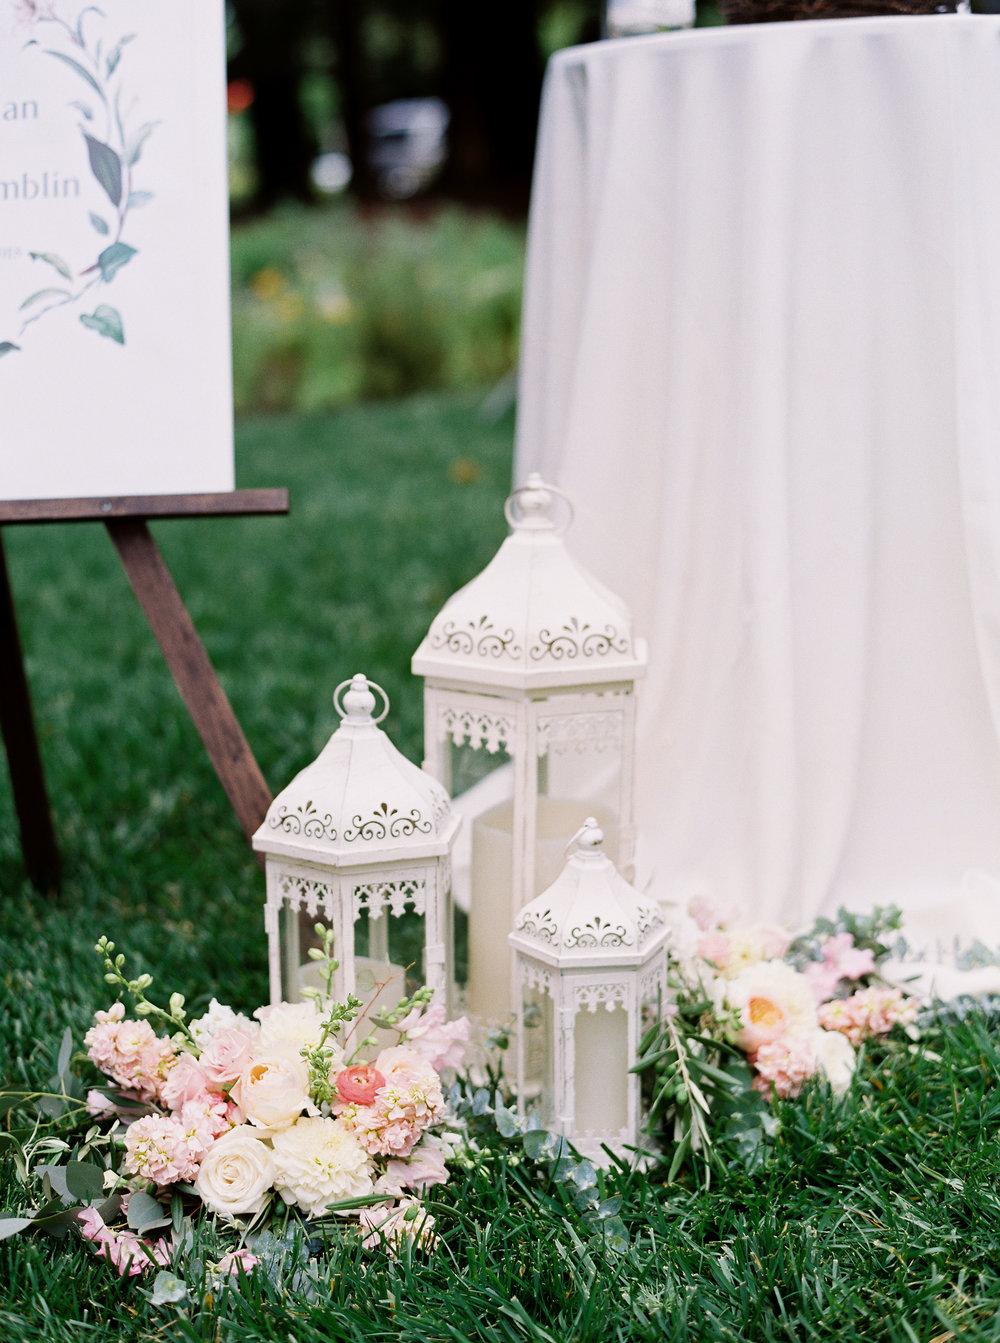 Harvest-inn-wedding-in-napa-california-216.jpg